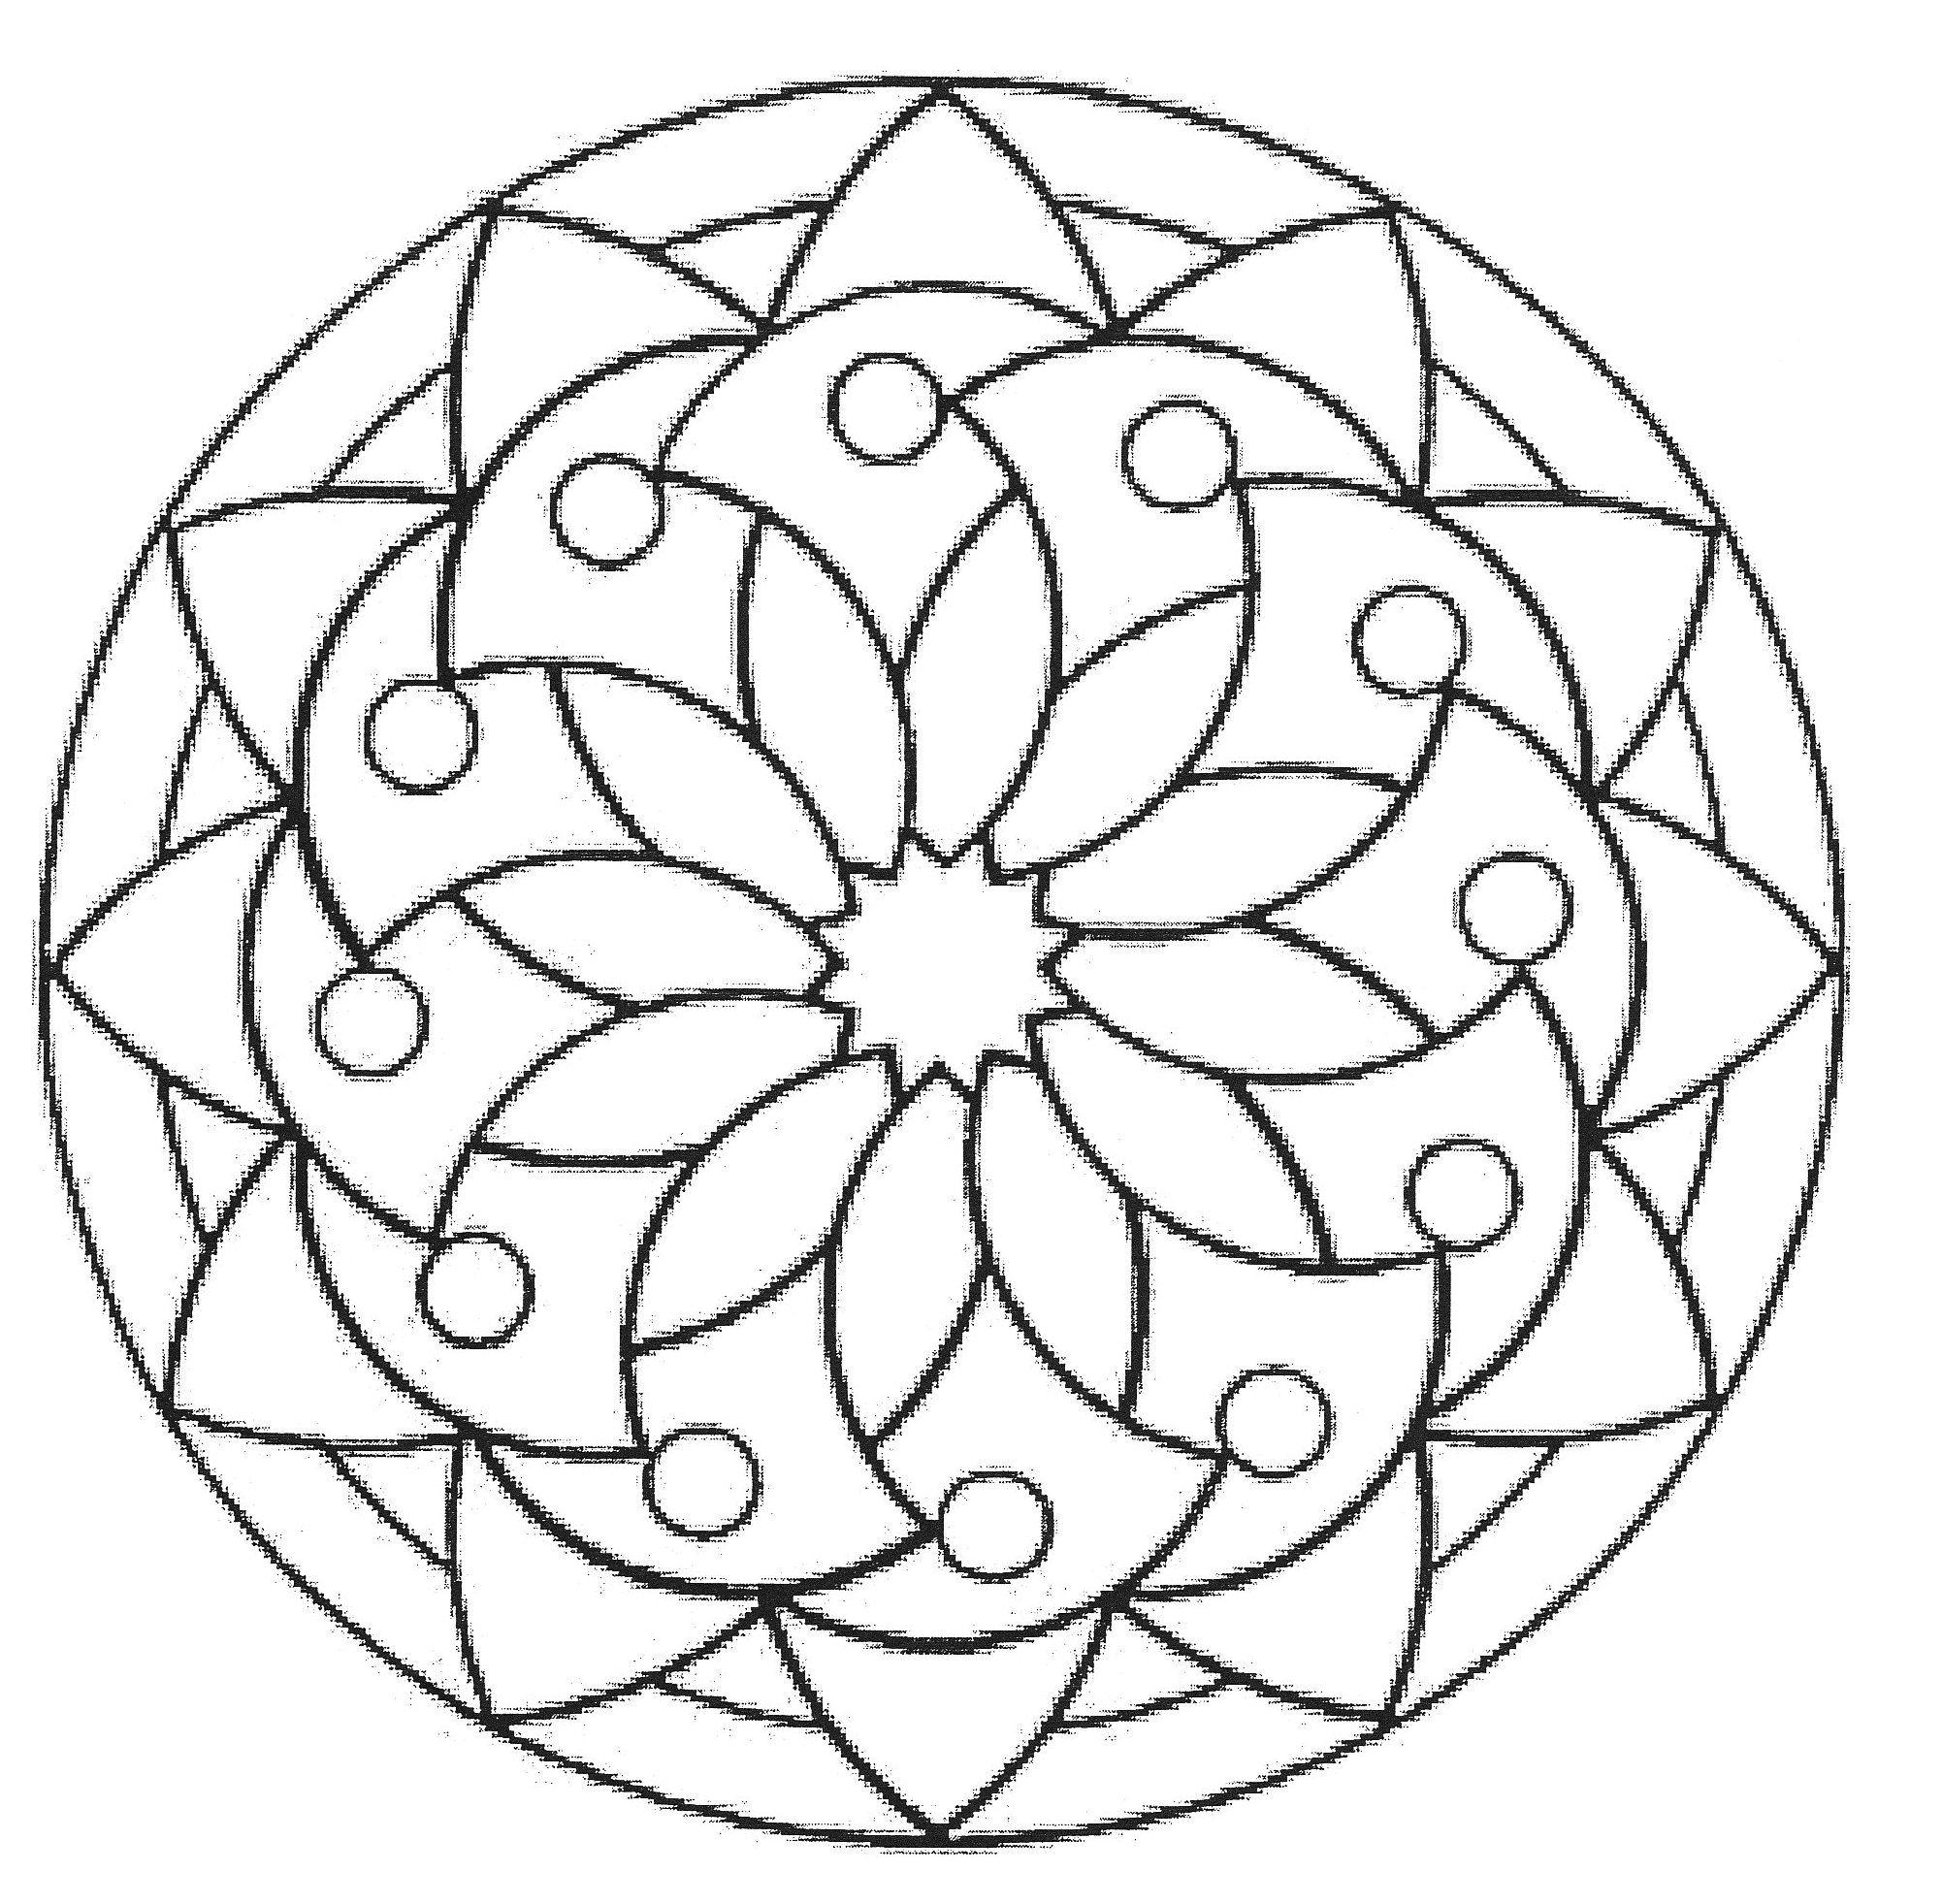 Mandala Modelos - Hippie Mandala, Tie Dye & More | Mandalas ...